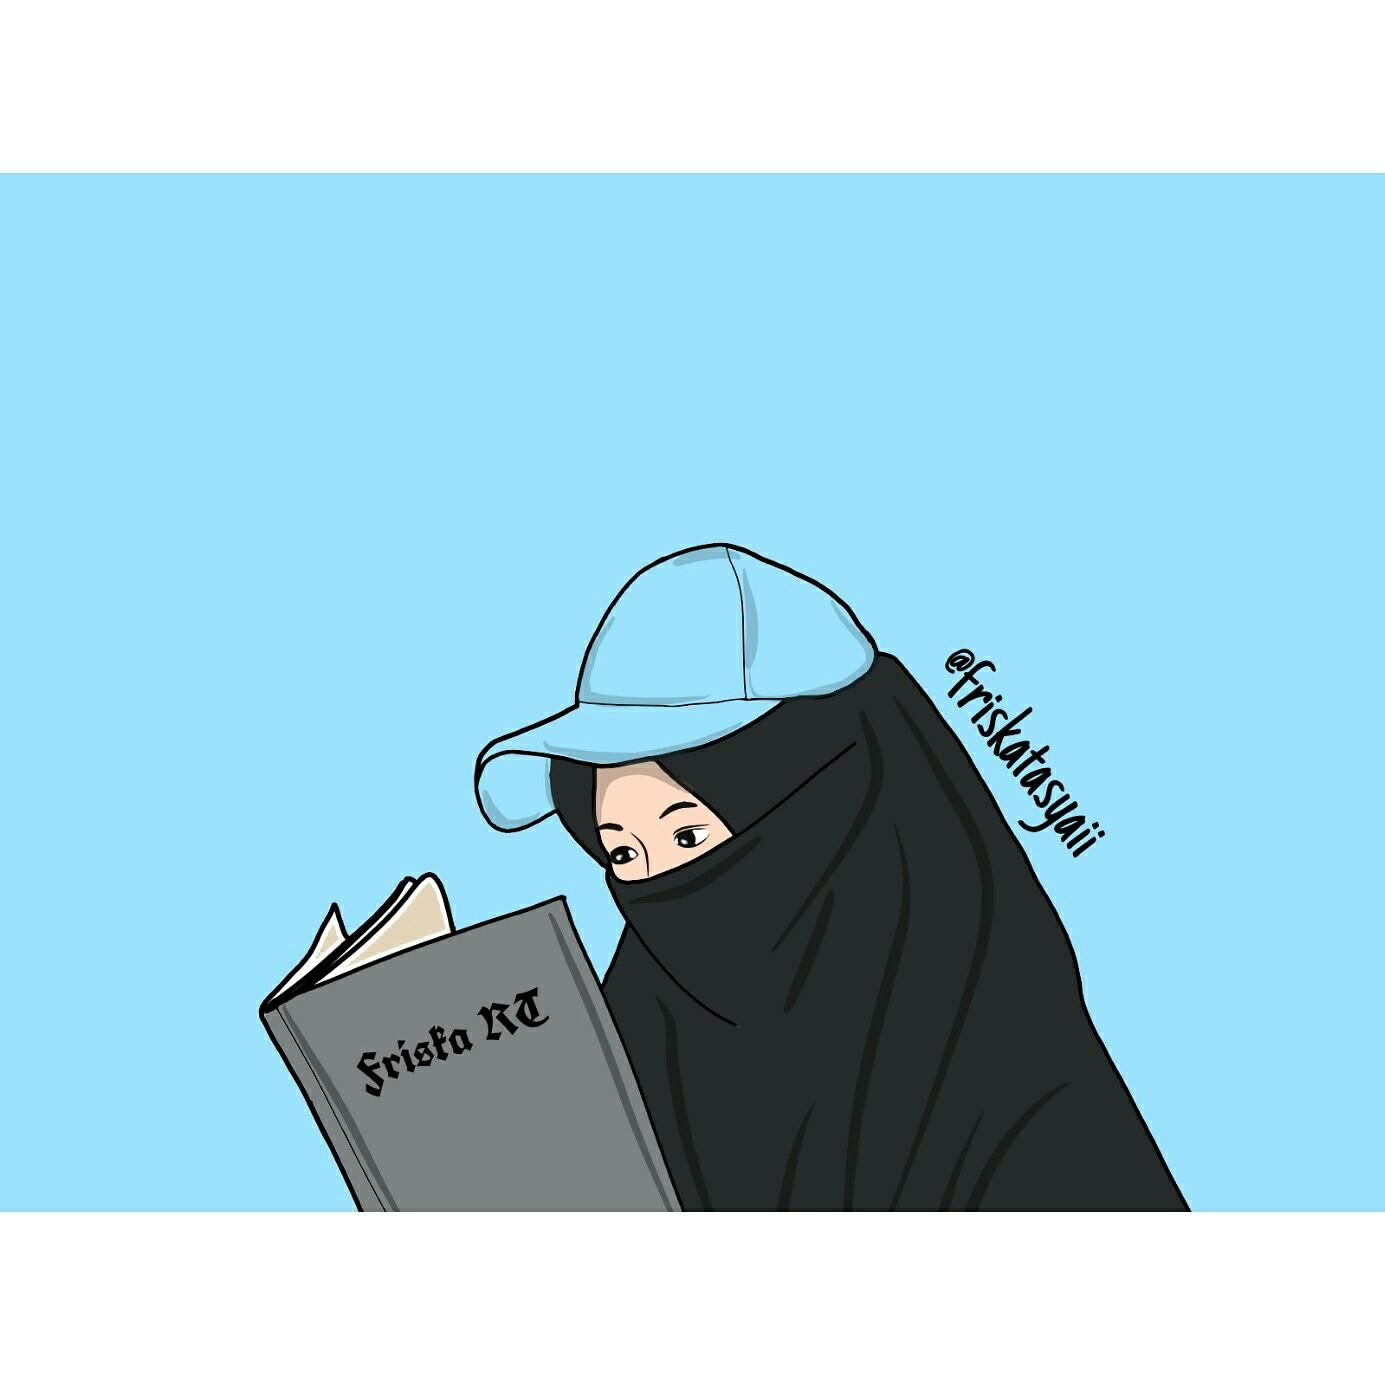 Gambar Kartun Muslimah Bercadar Membaca Buku Kartun Muslimah